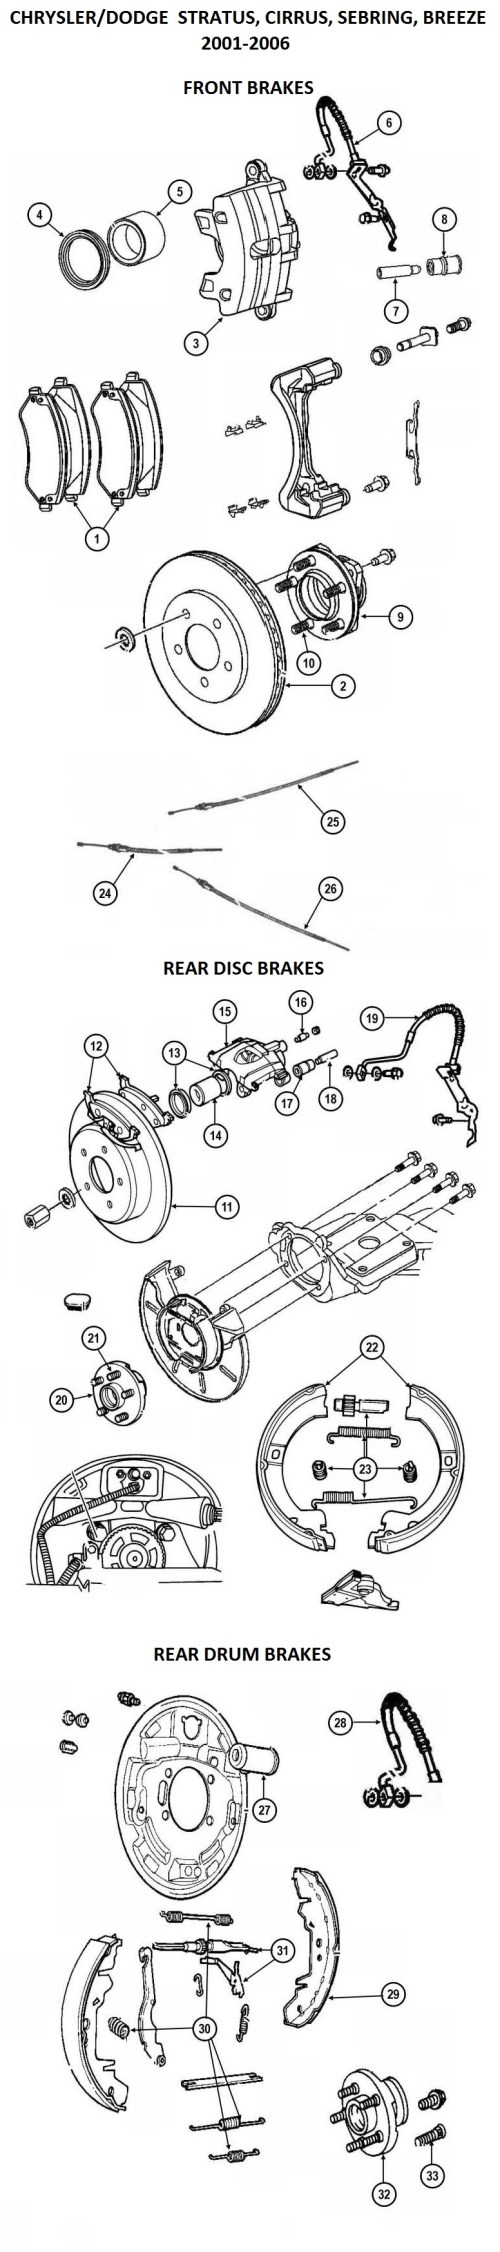 small resolution of usauto parts for chrysler 2000dodgeneonenginediagram 2000 dodge neon engine diagram car